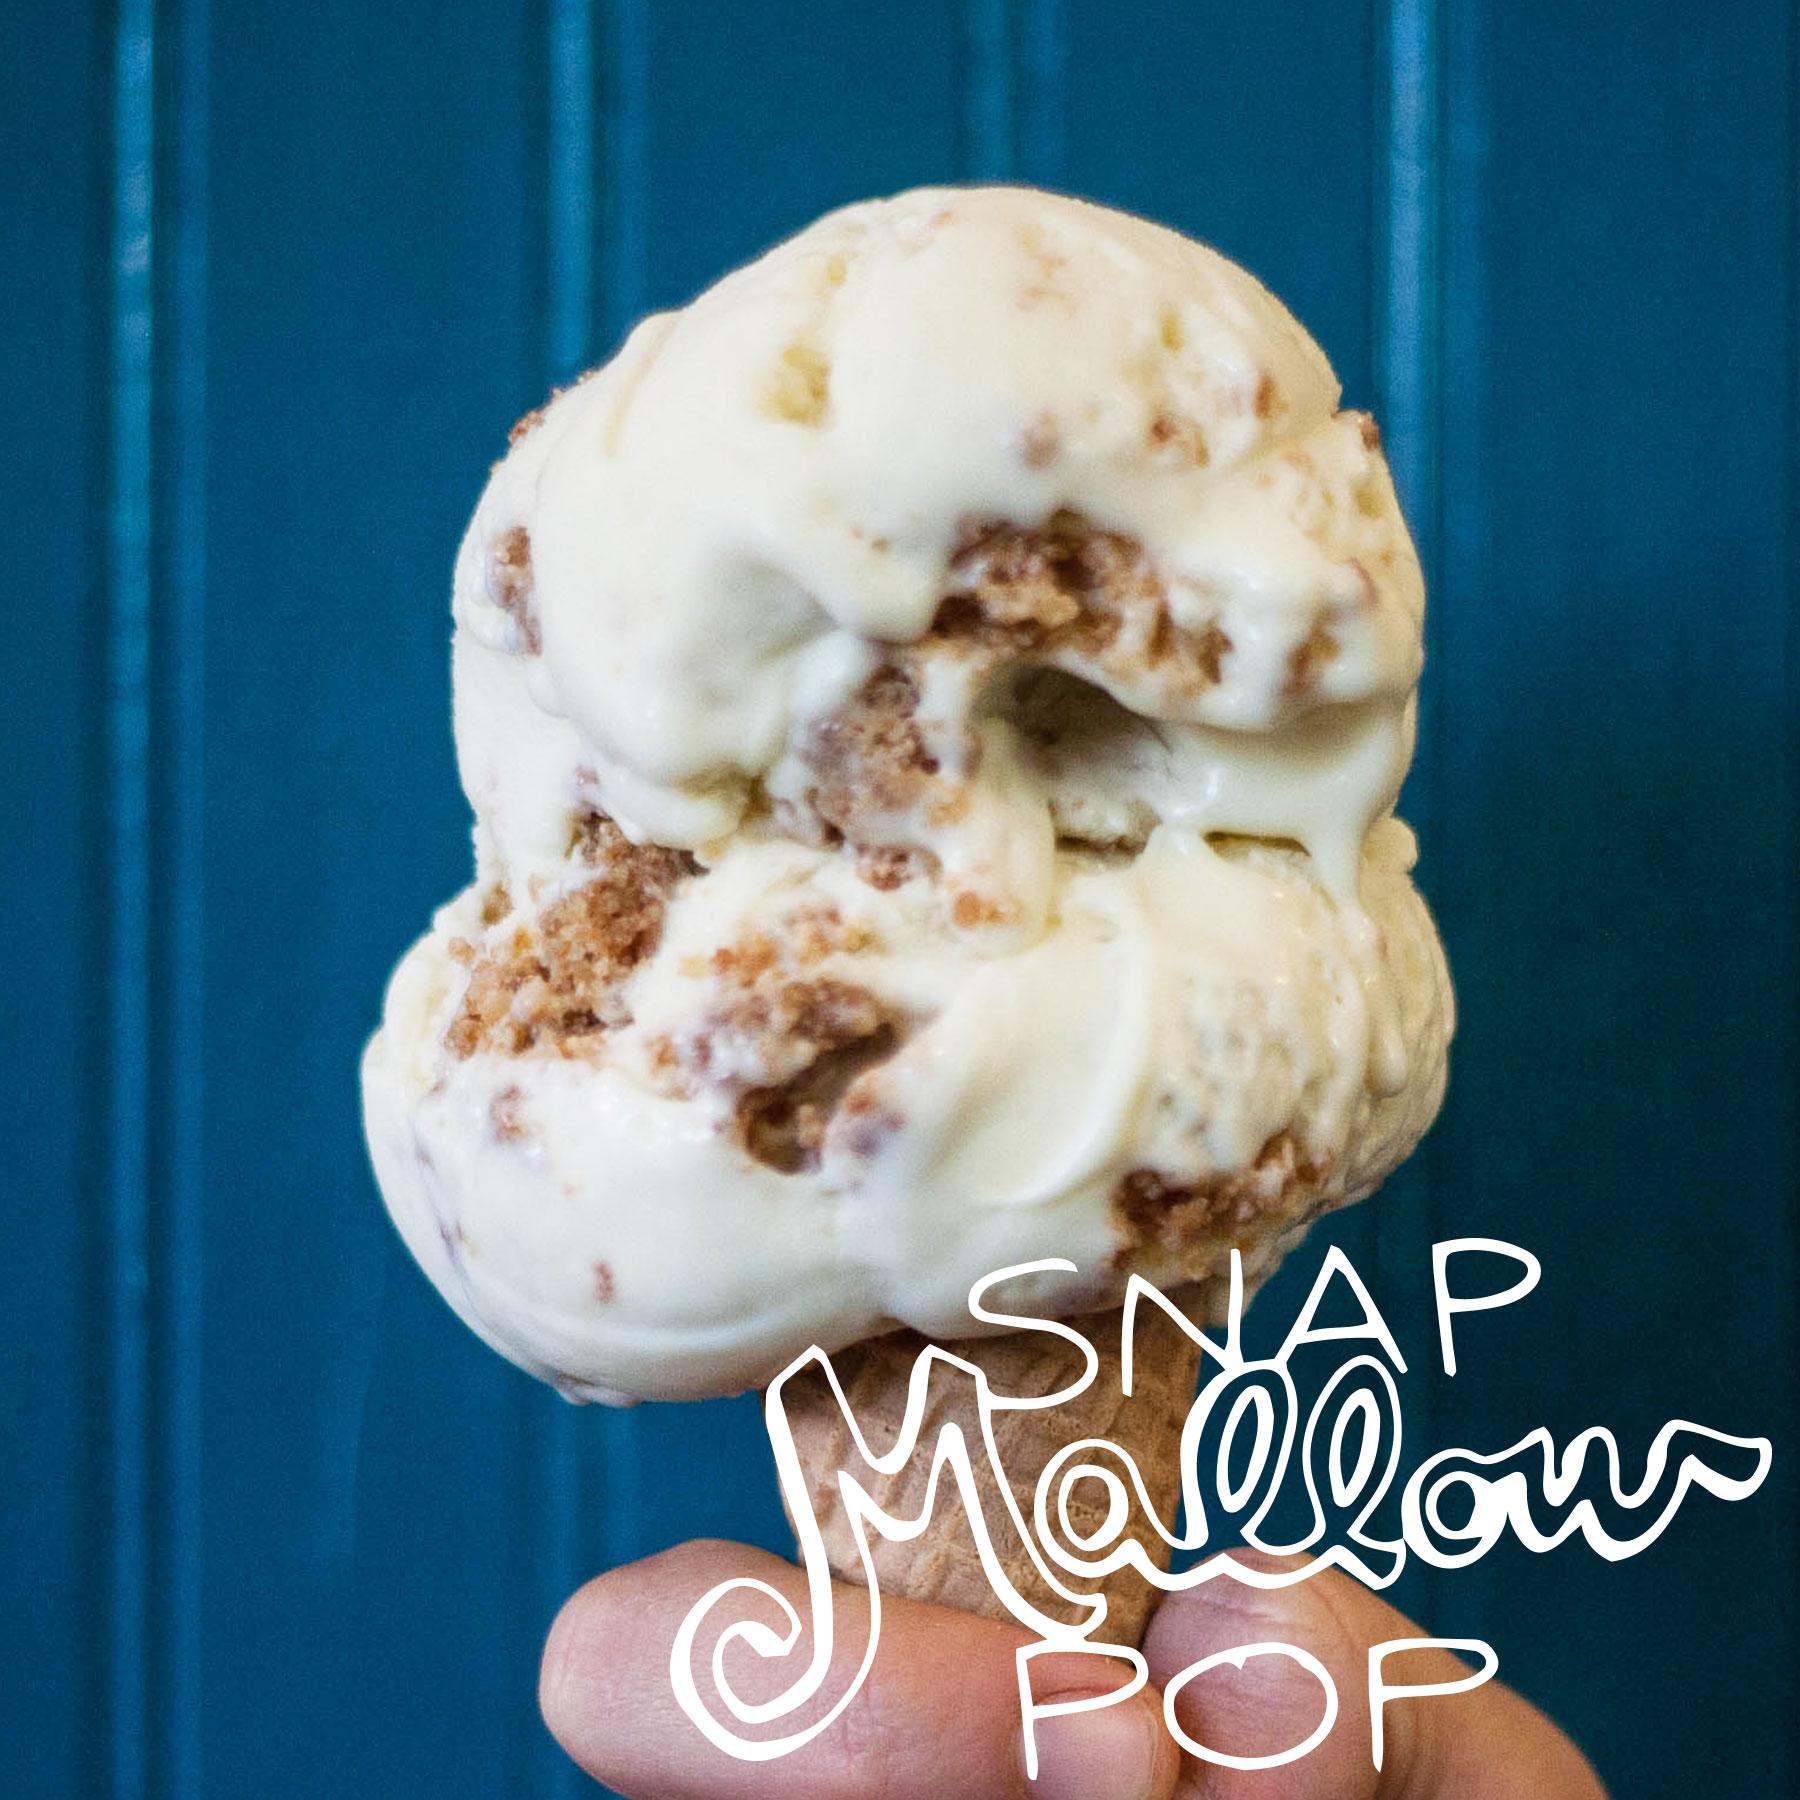 Flavor02-lg_SnapMallowPop.jpg